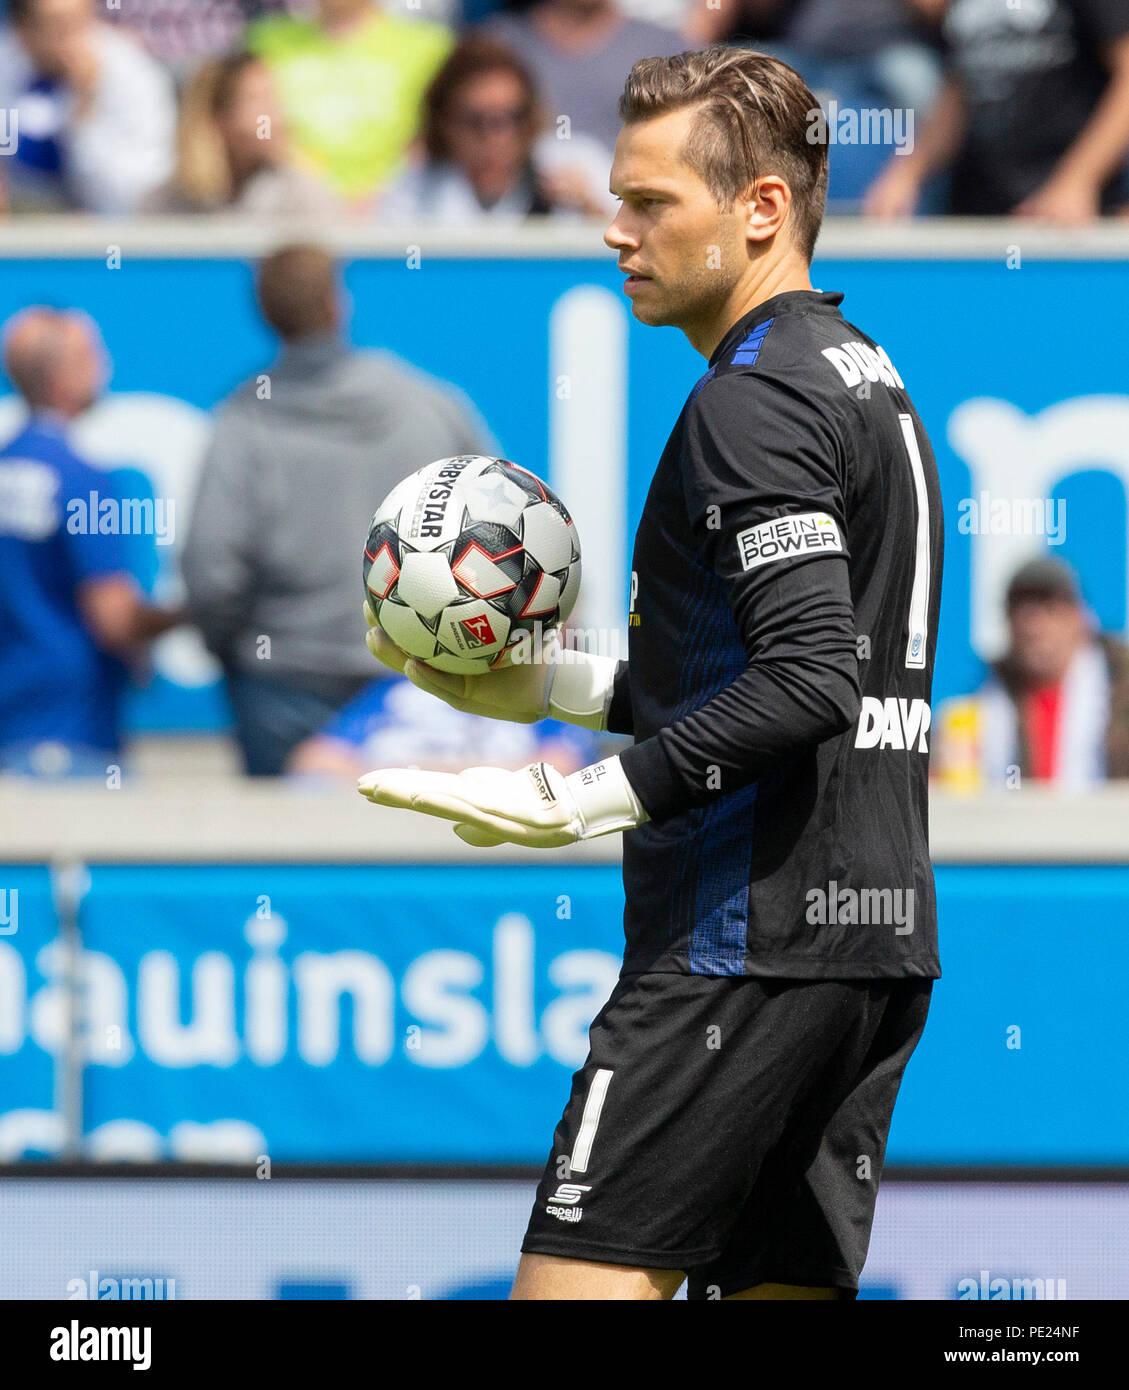 Duisburg, Germany August 11 2018, 2nd league, MSV Duisburg vs VfL Bochum:  Goalkeeper Daniel Davari (MSV) gestures.                 Credit: Juergen Schwarz/Alamy Live News - Stock Image